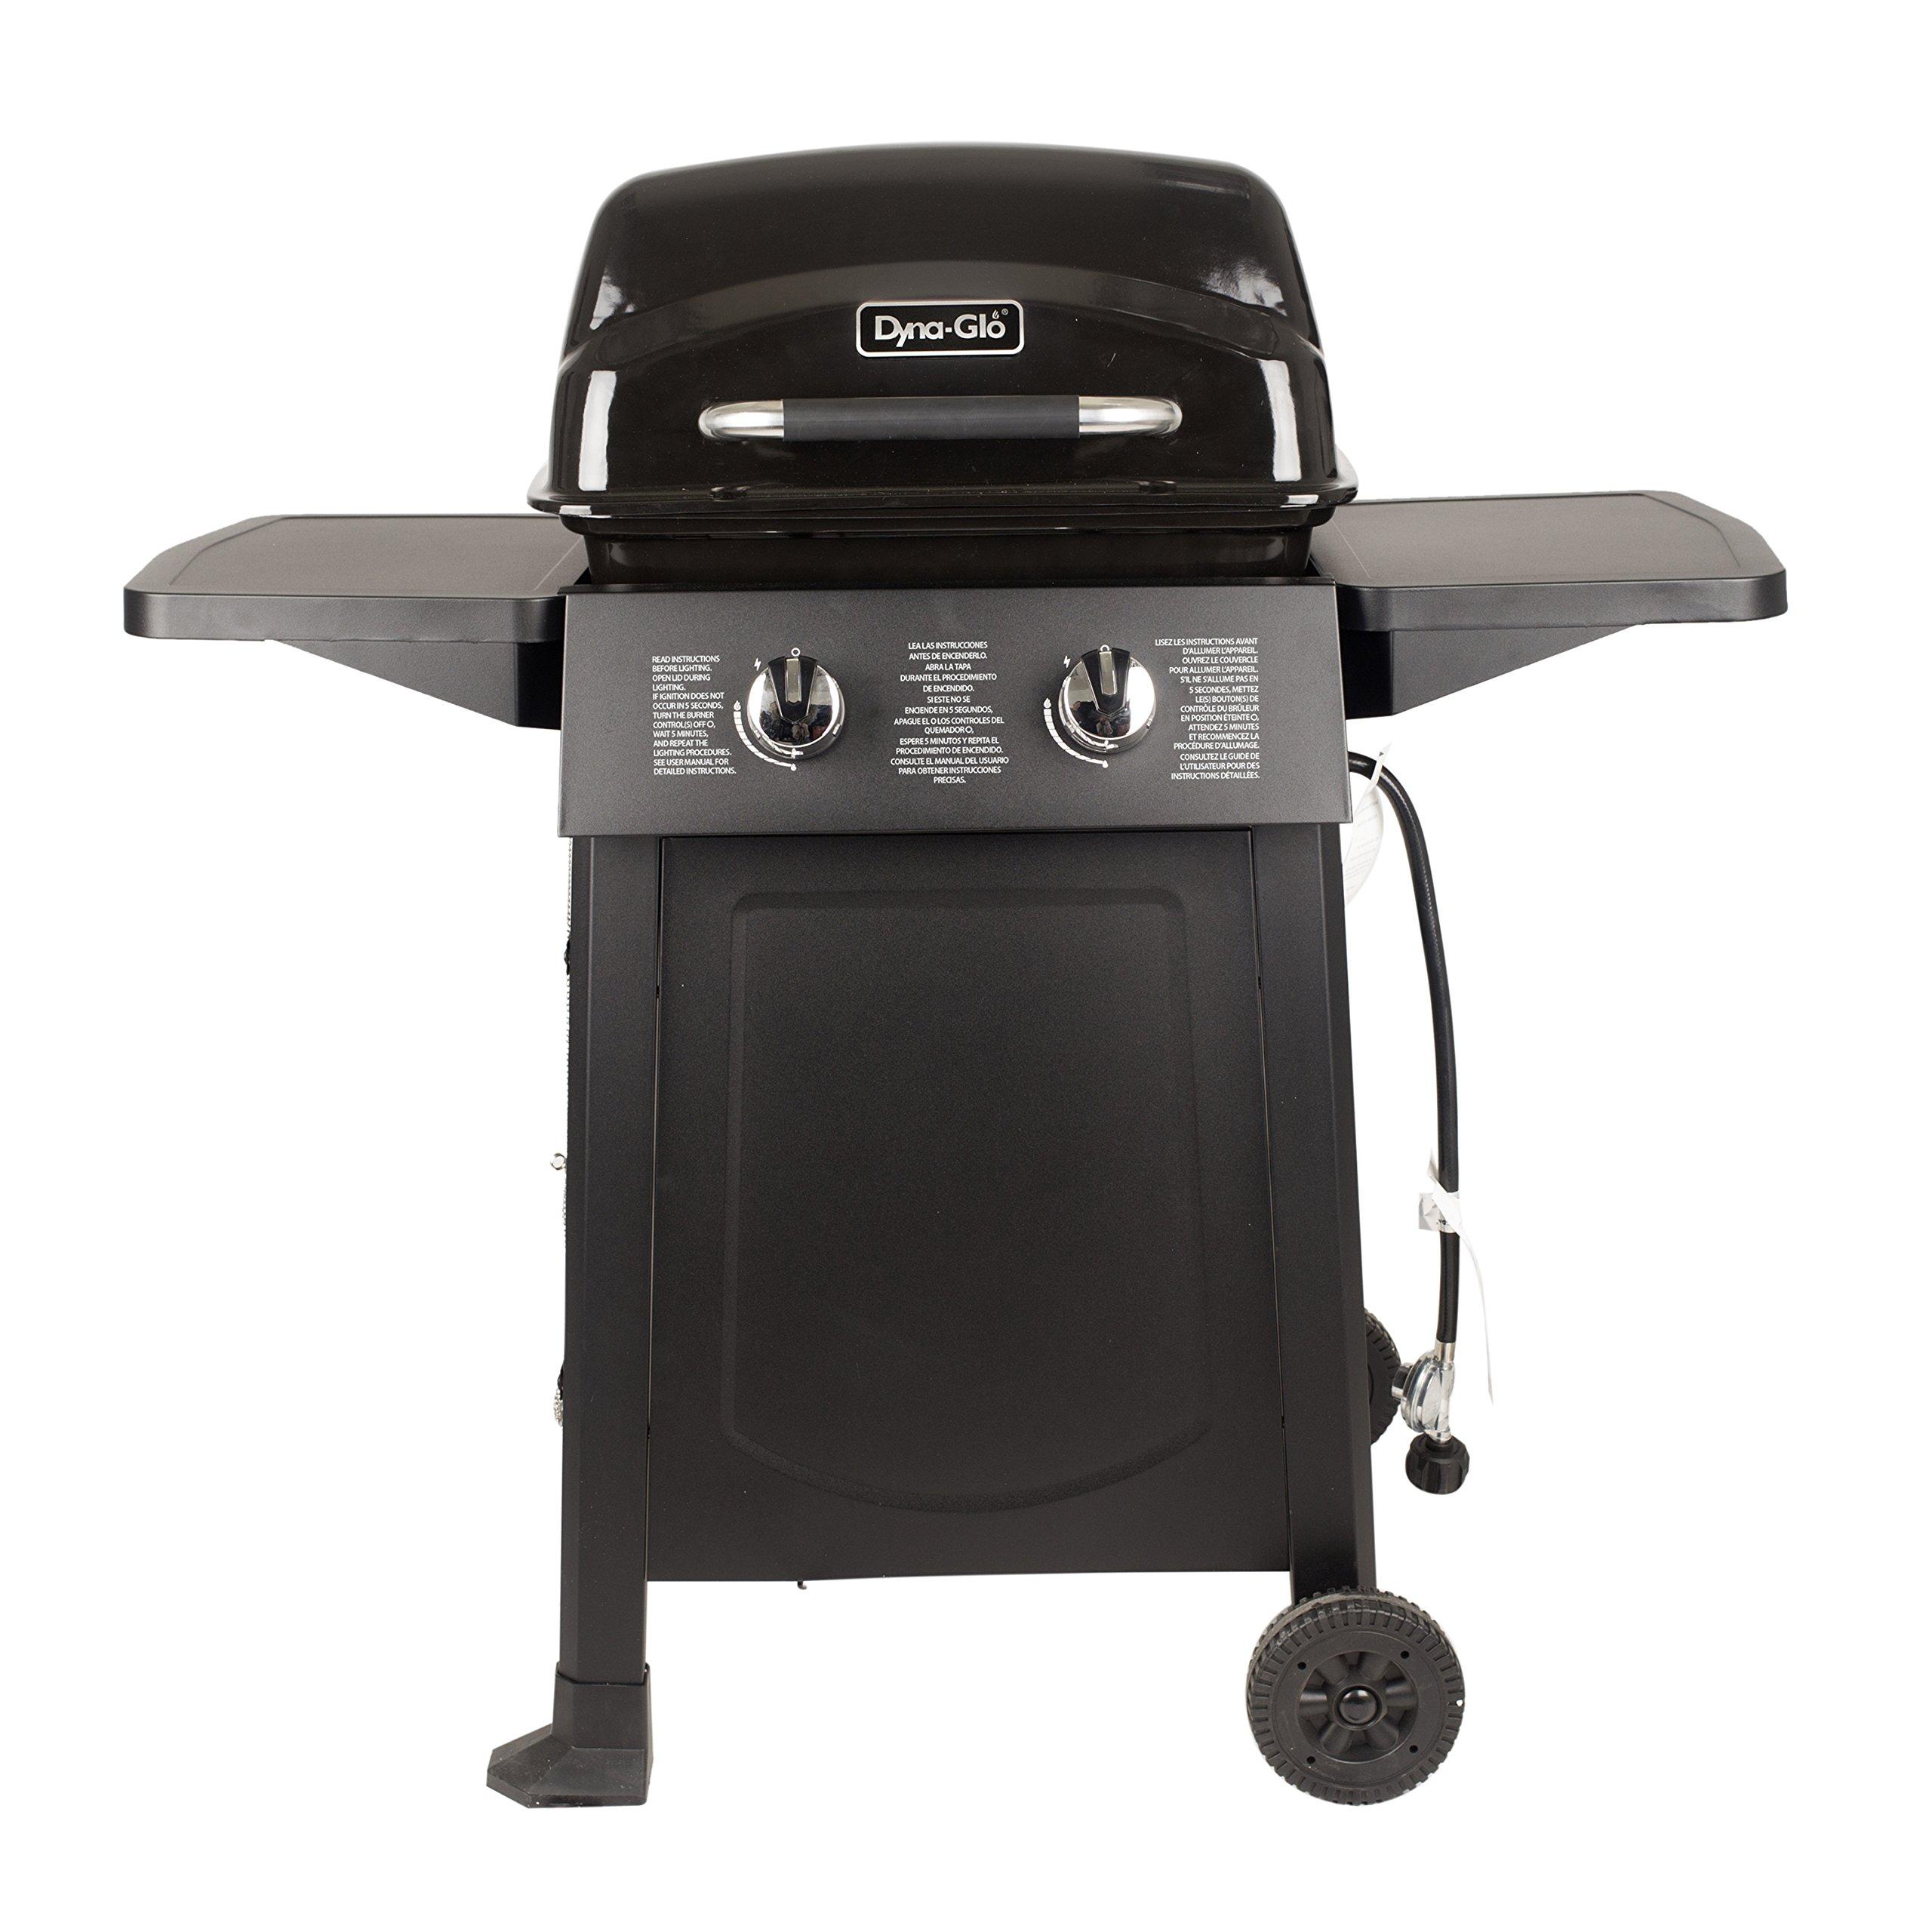 Dyna-Glo DGB300CNP-D 2 Burner Open Cart Propane Gas Grill